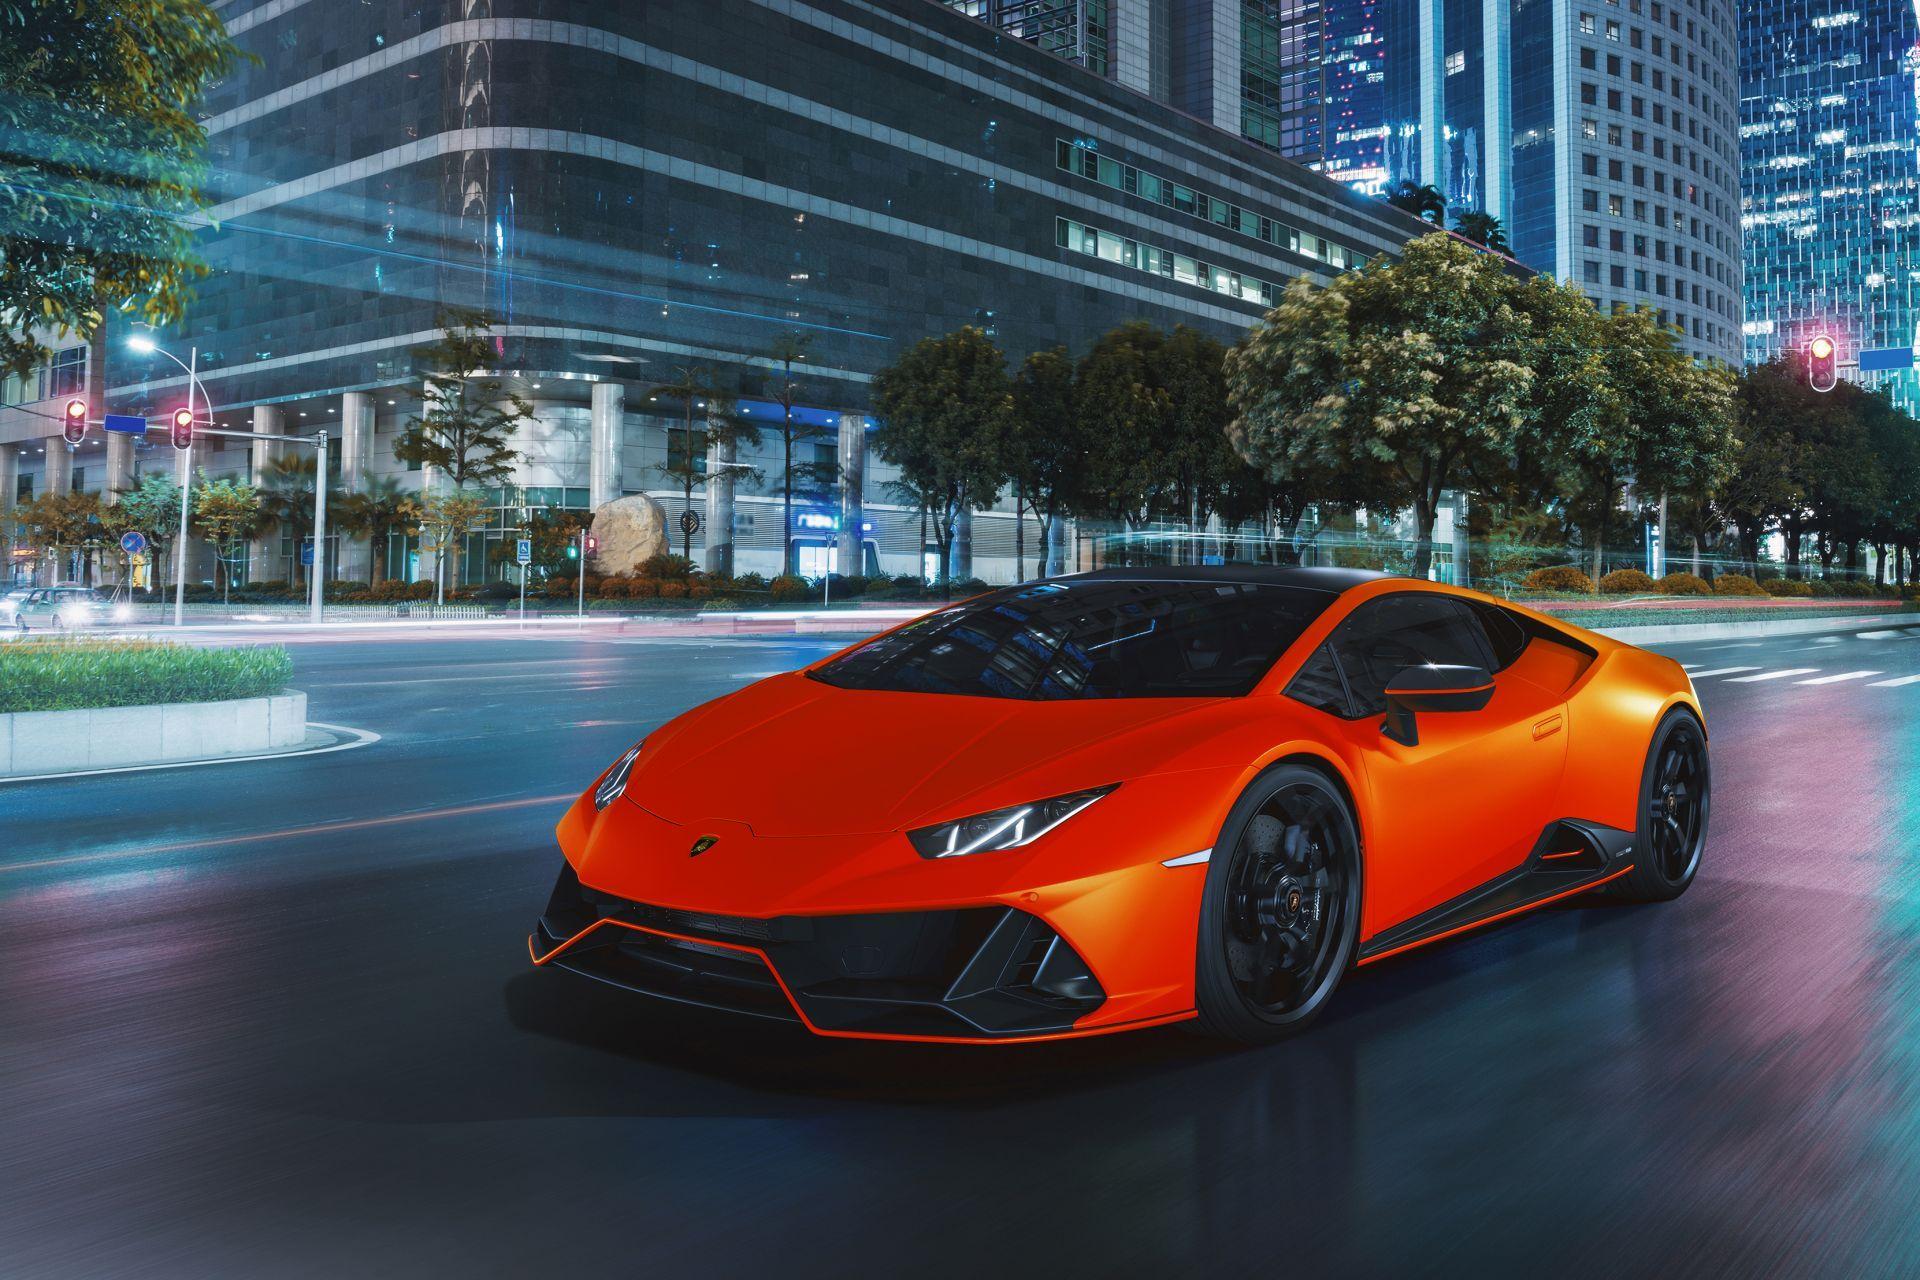 Lamborghini-Huracan-Evo-Fluo-Capsule-9